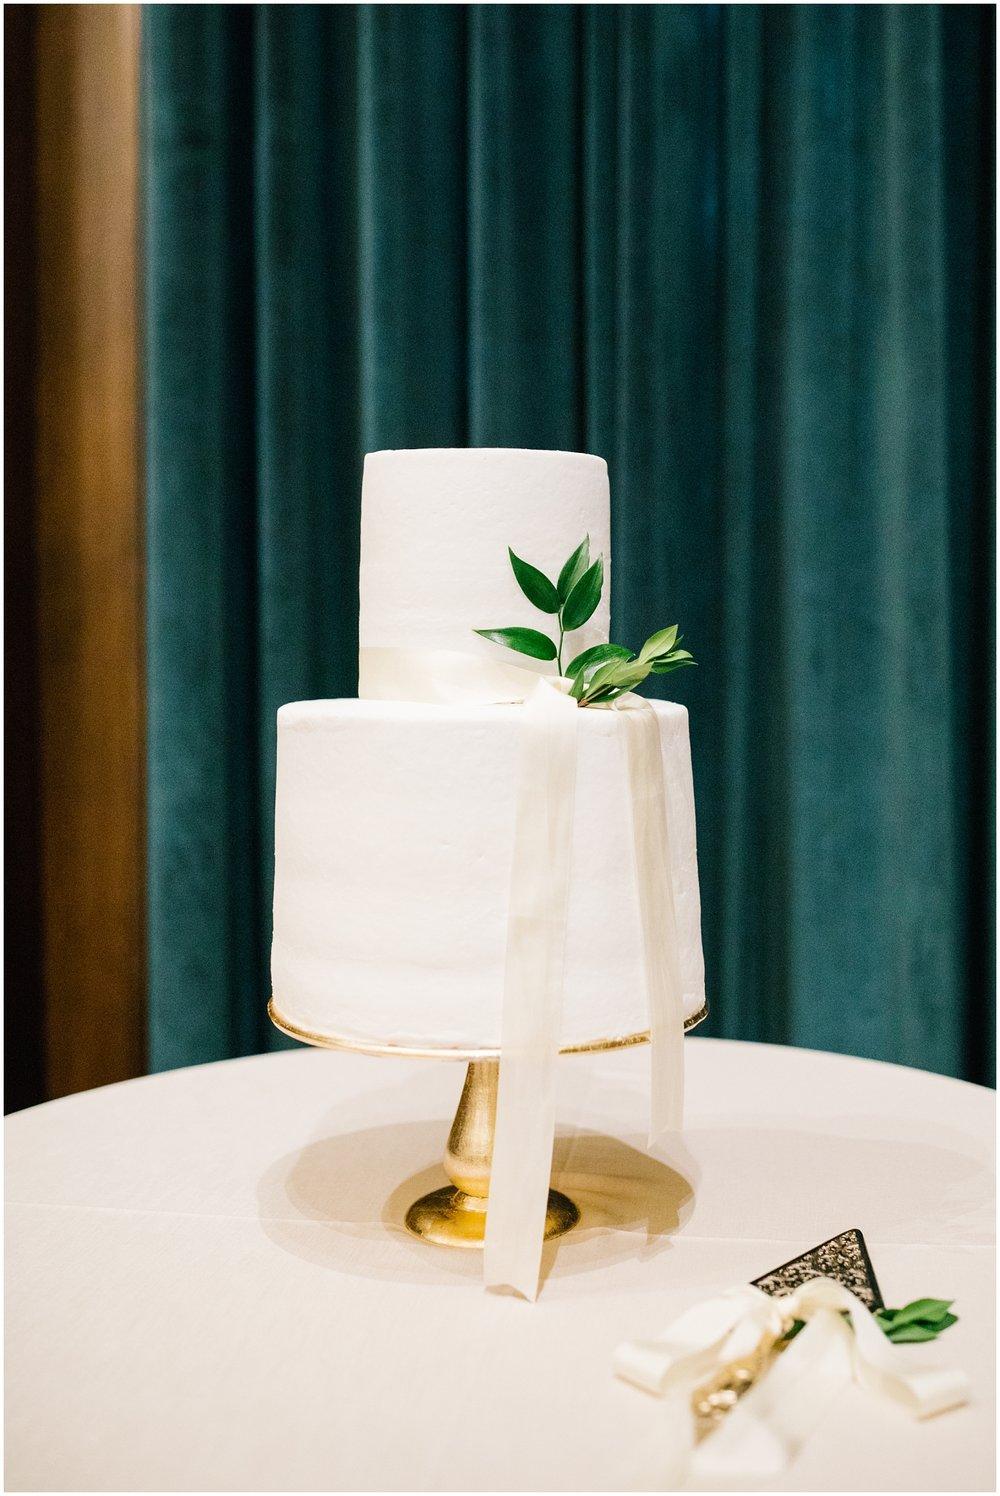 JC-Wedding-353_Lizzie-B-Imagery-Utah-Wedding-Photographer-Park-City-Salt-Lake-City-Temple-Joseph-Smith-Memorial-Building-Empire-Room.jpg